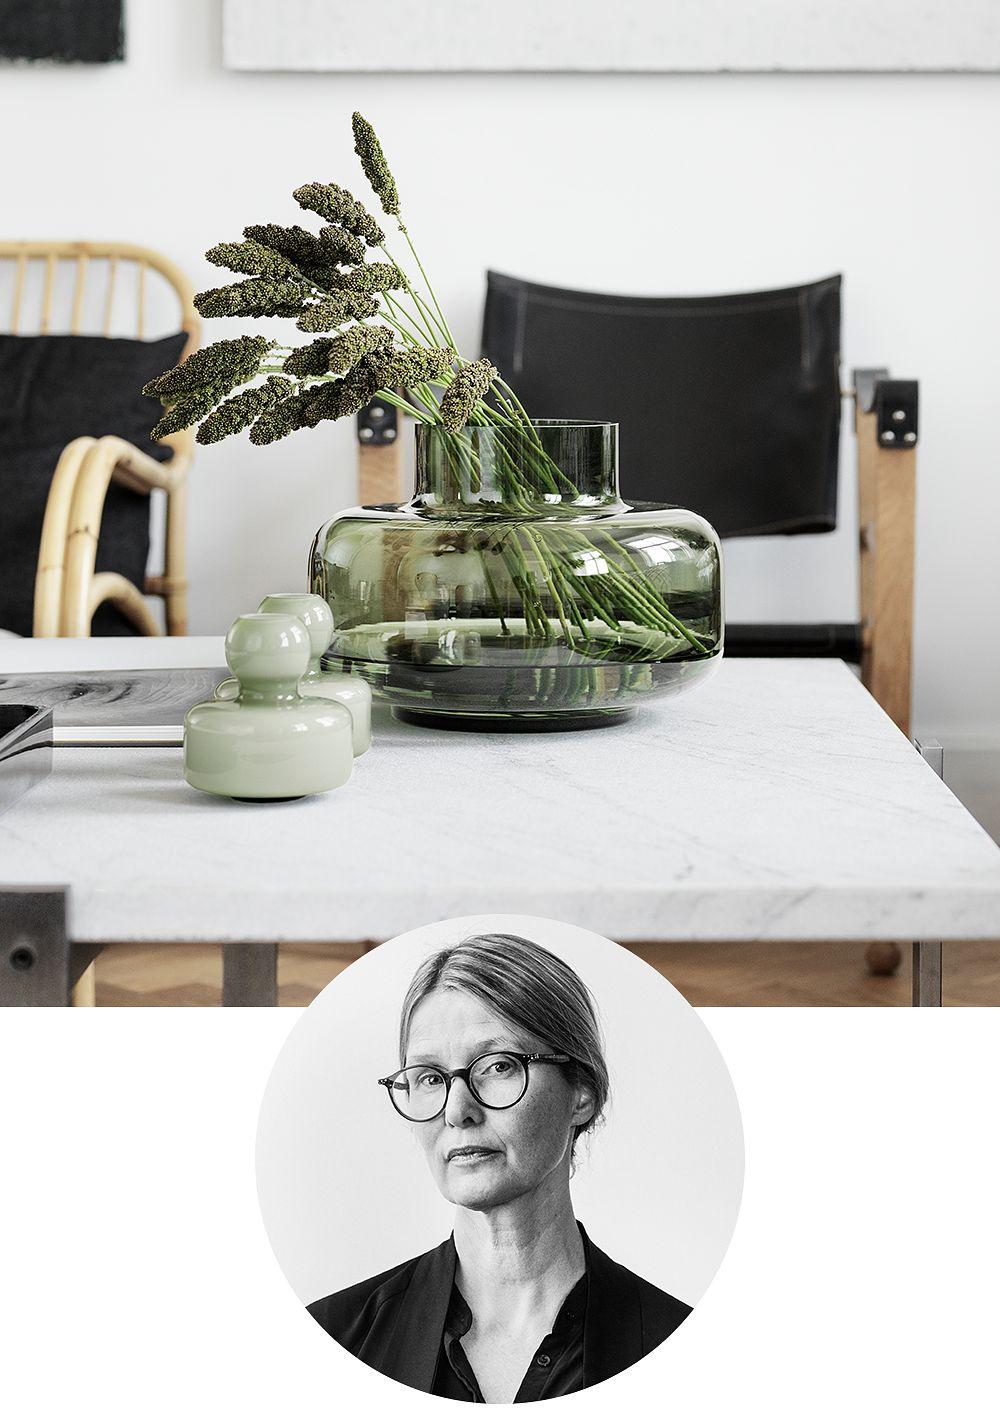 Designer Carina Seth Andersson and her Urna and Mini vases designed for Marimekko.